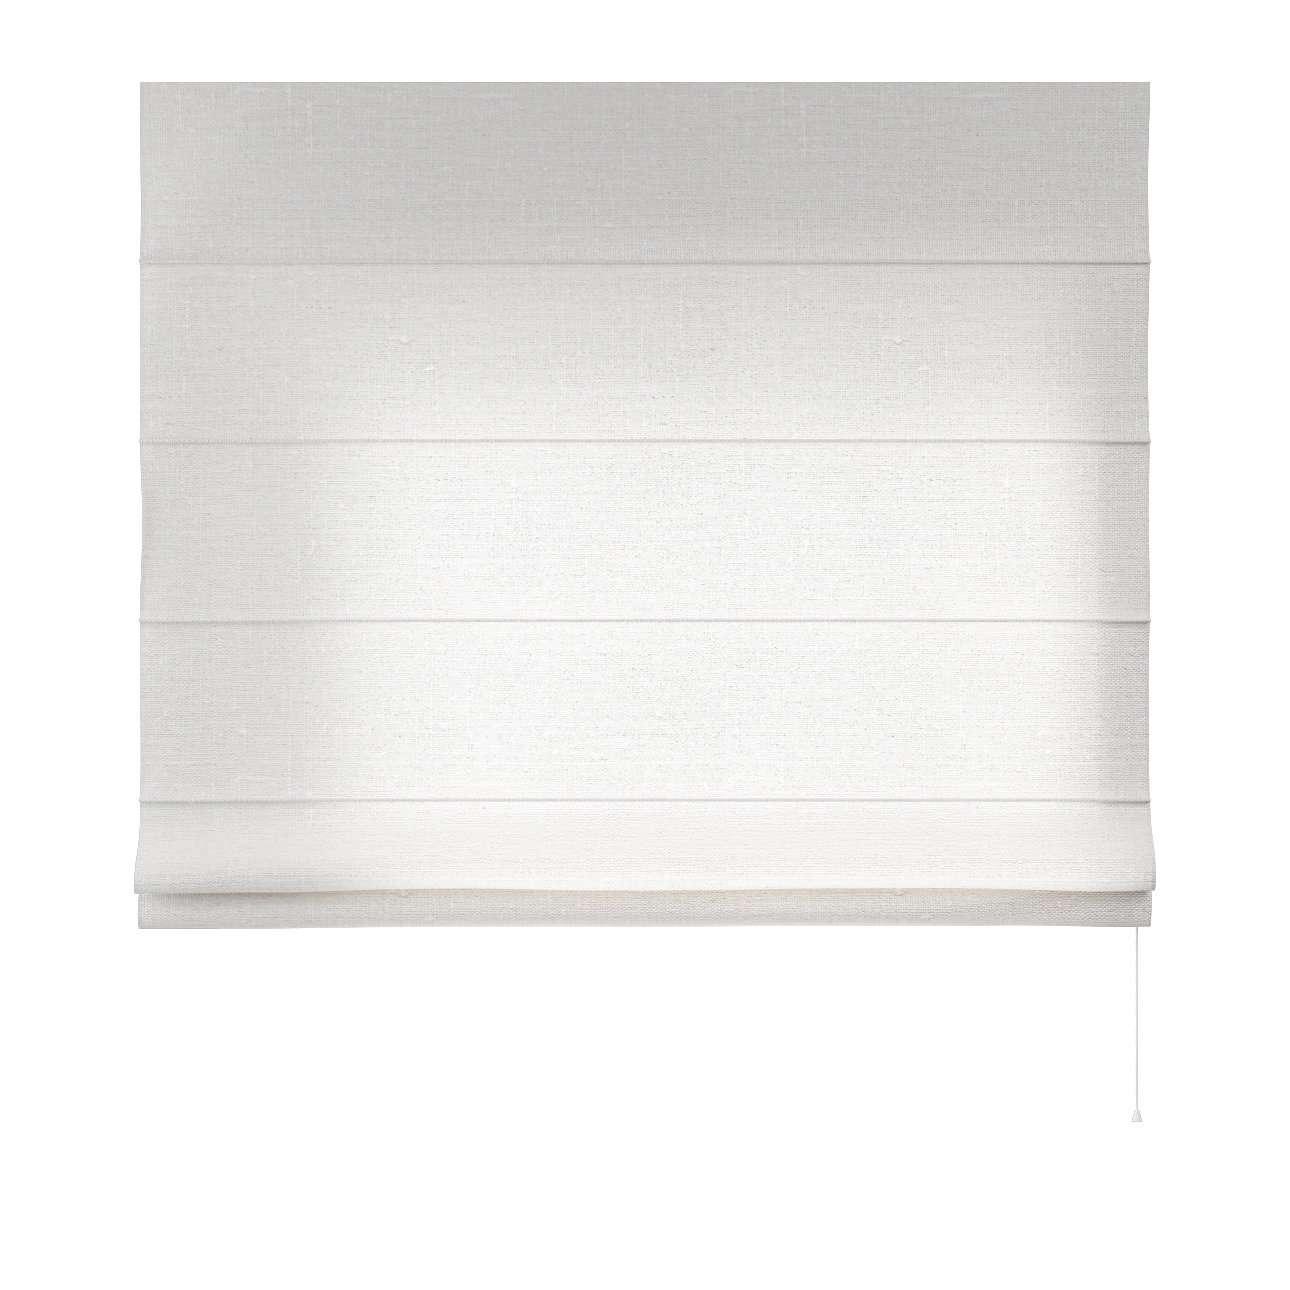 Foldegardin Capri<br/>Uden flæsekant 80 x 170 cm fra kollektionen Linen, Stof: 392-04